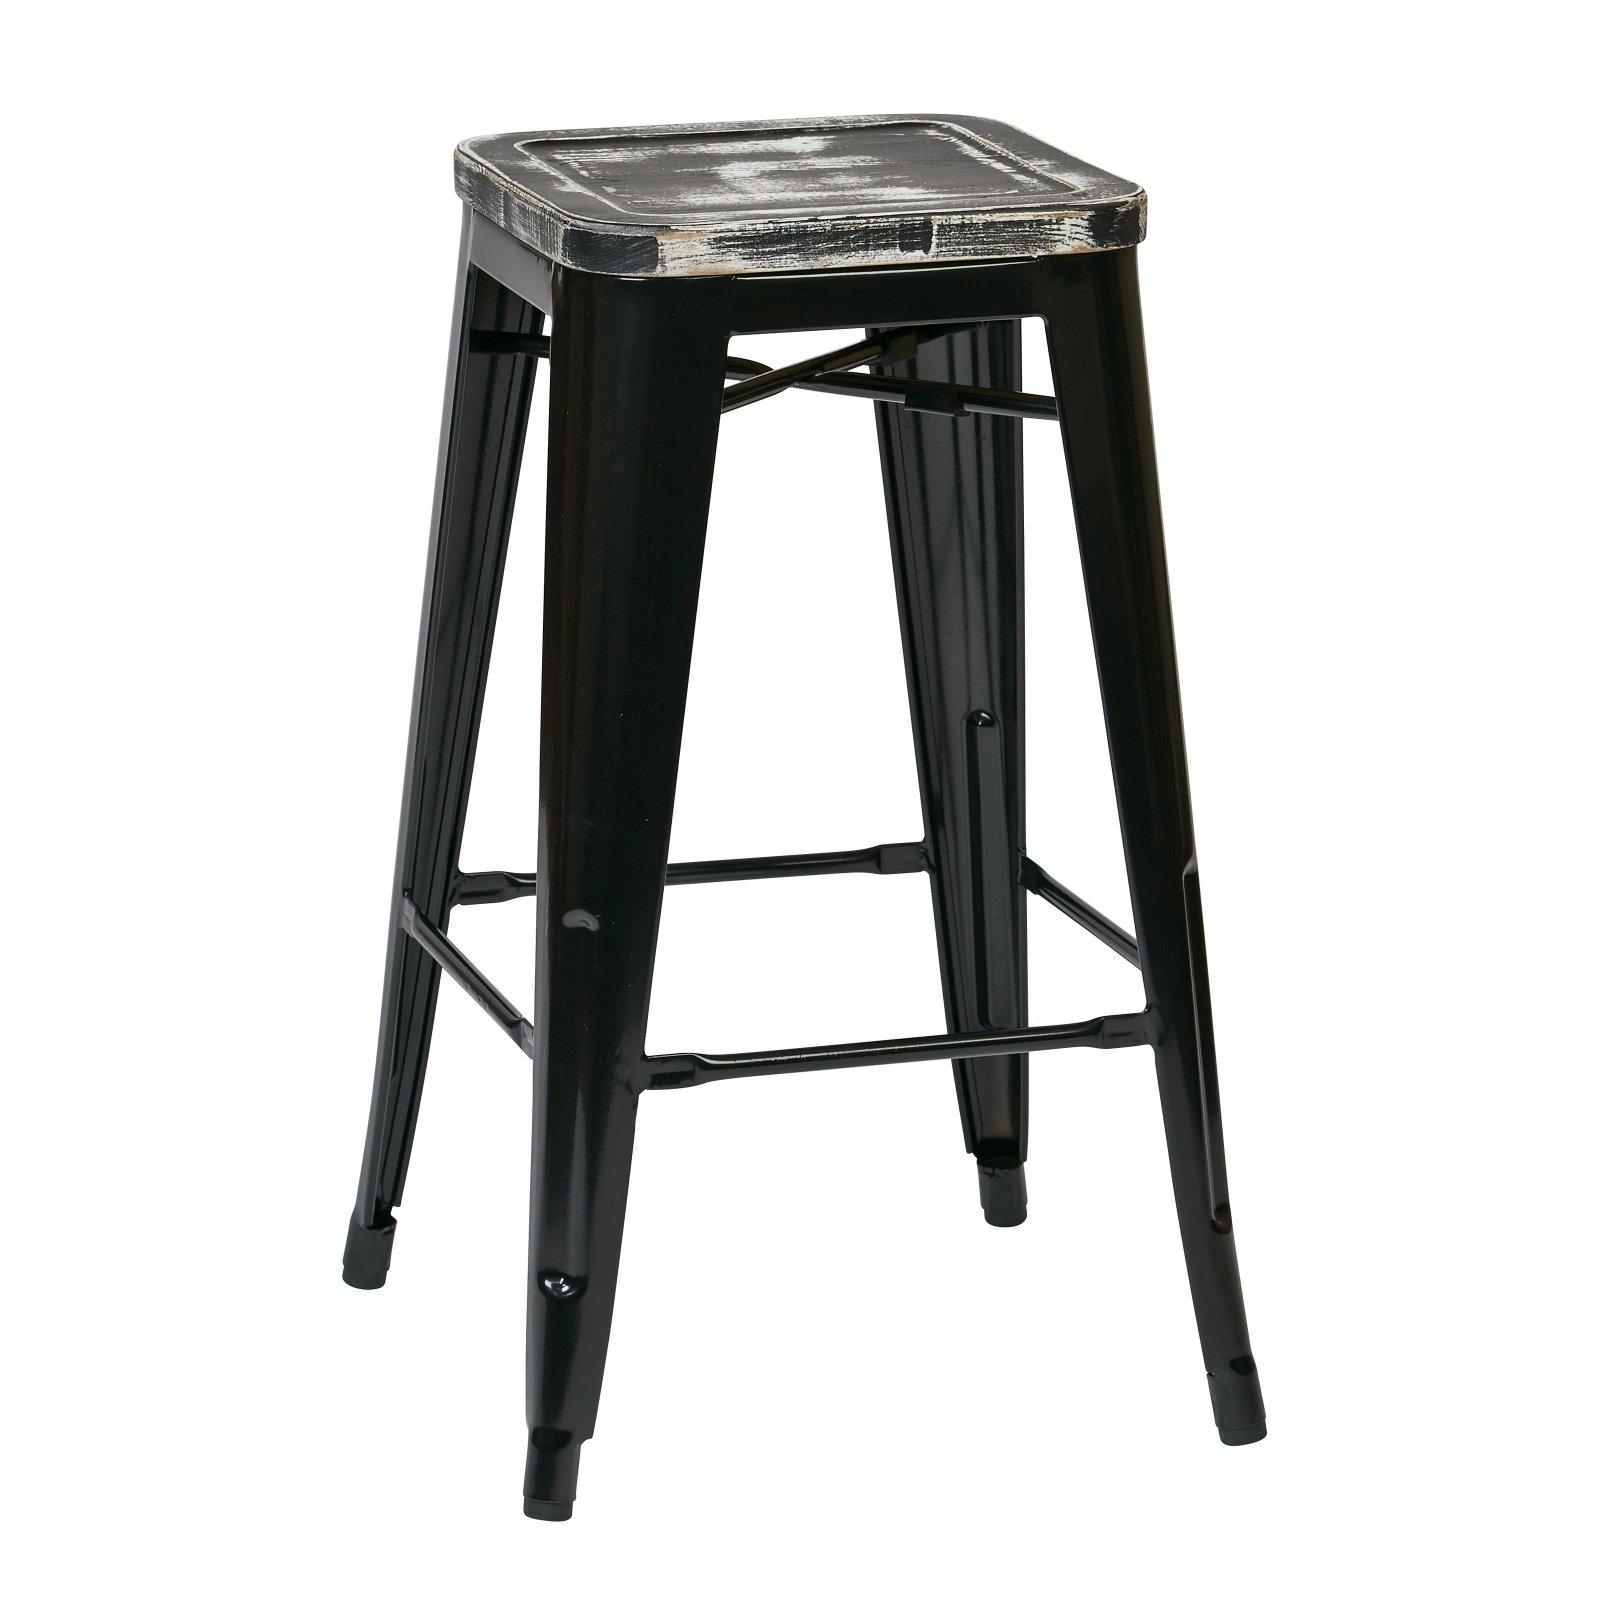 Osp Designs Bristow 26 In Metal Counter Stool With Vintage Wood Seat Metal Bar Stools Metal Counter Stools Black Bar Stools 26 inch metal bar stools